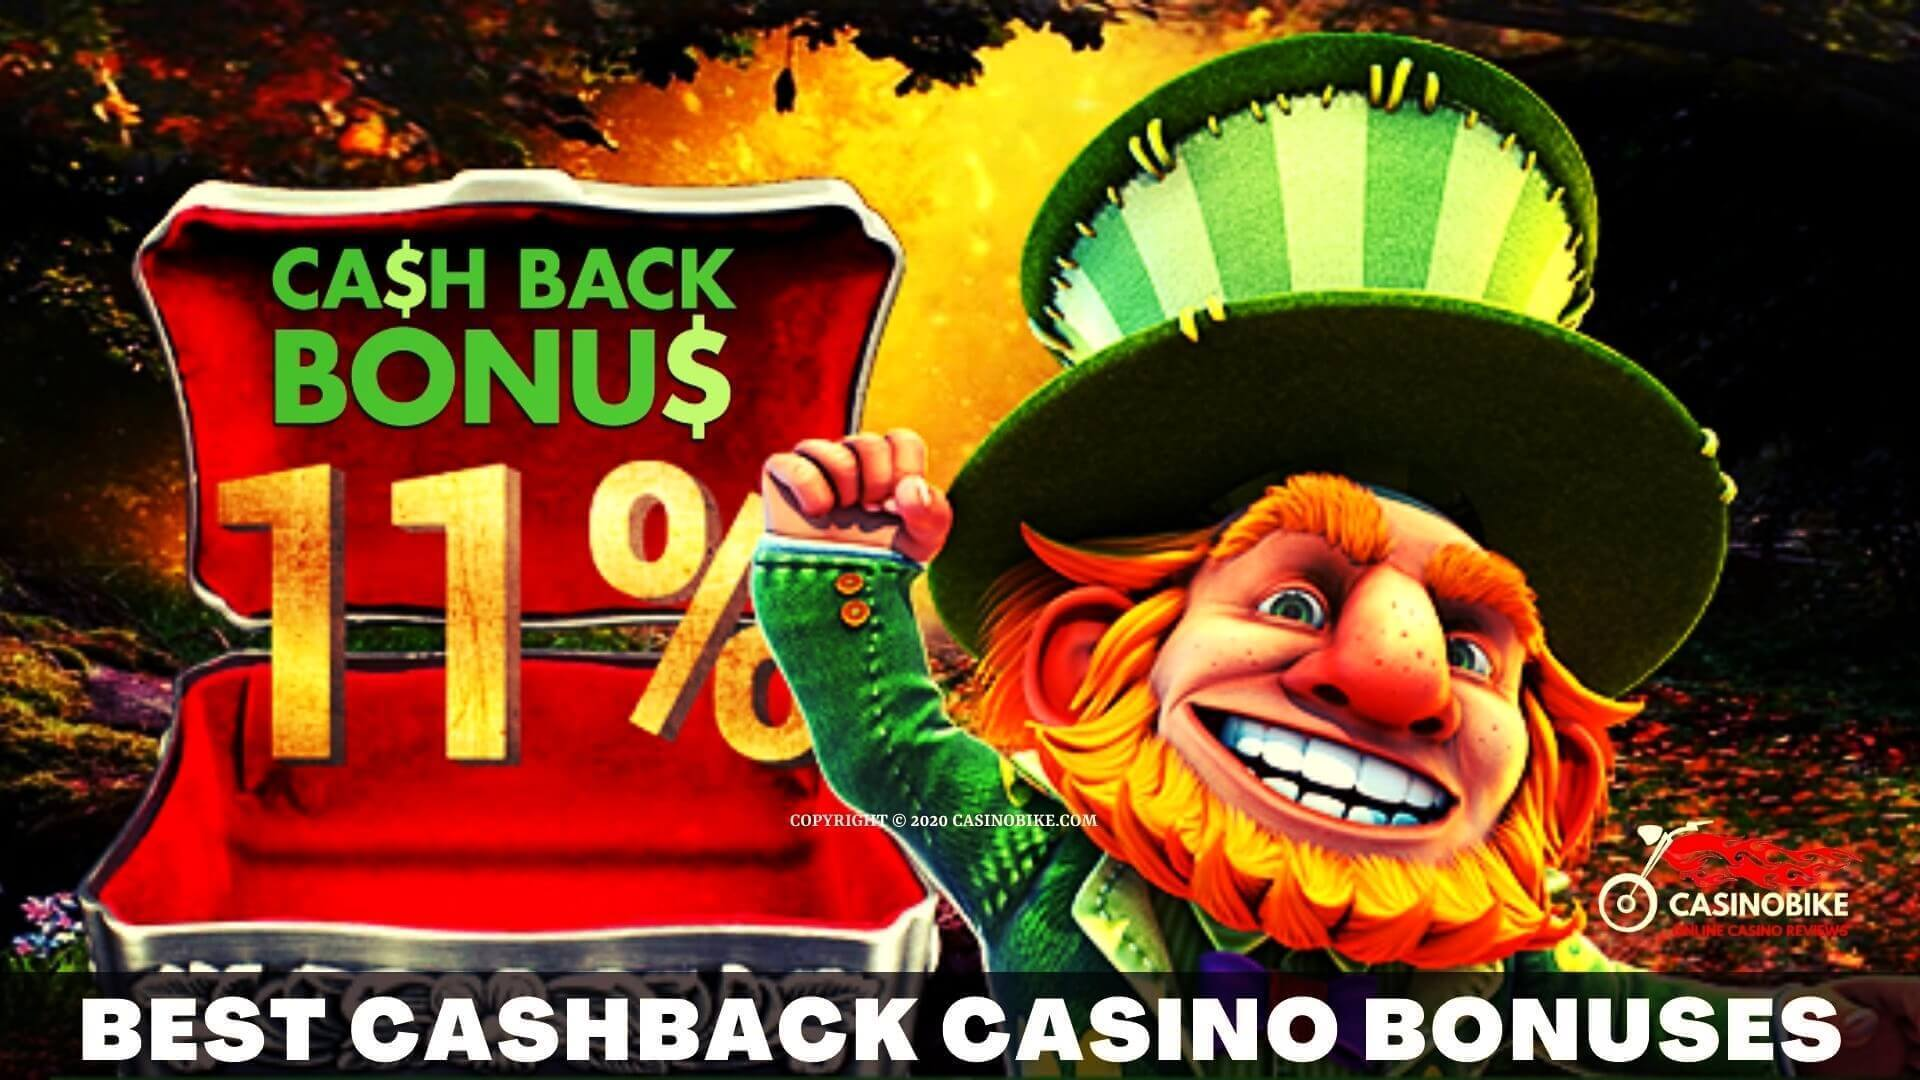 Best Cashback Casino Bonuses